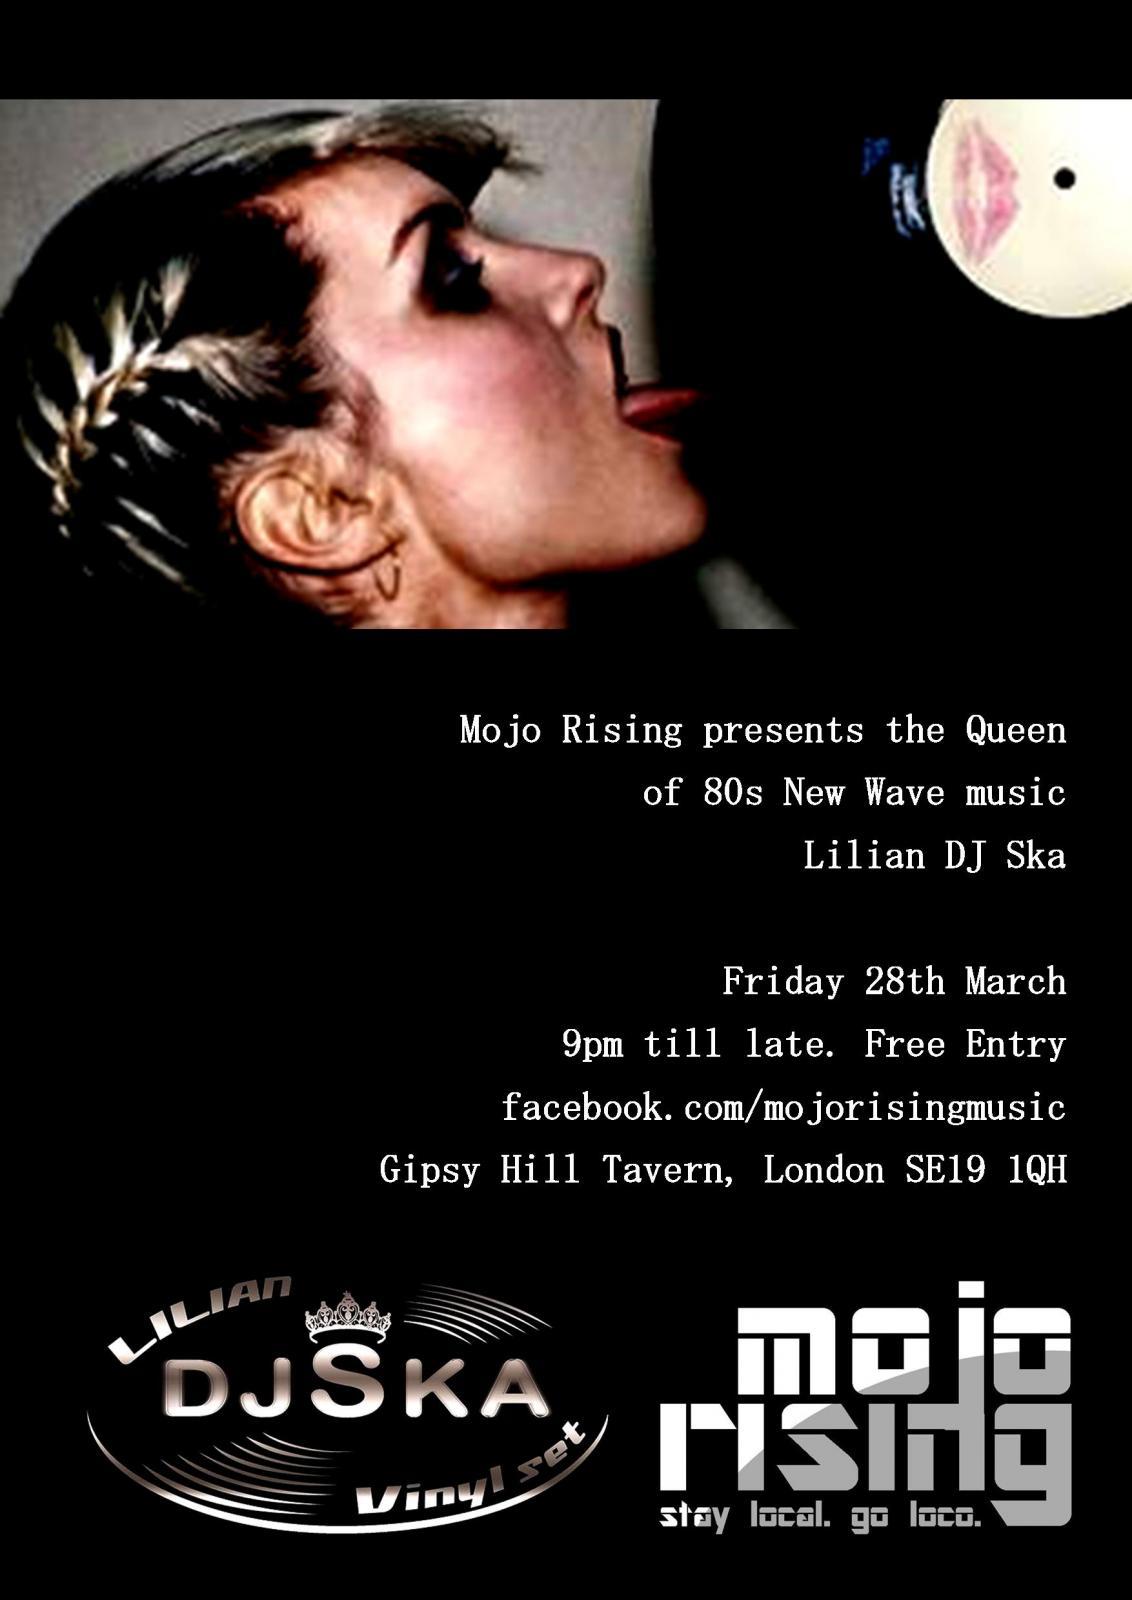 Mojo Rising 80s Night Gipsy Hill Tavern 9pm Virtual